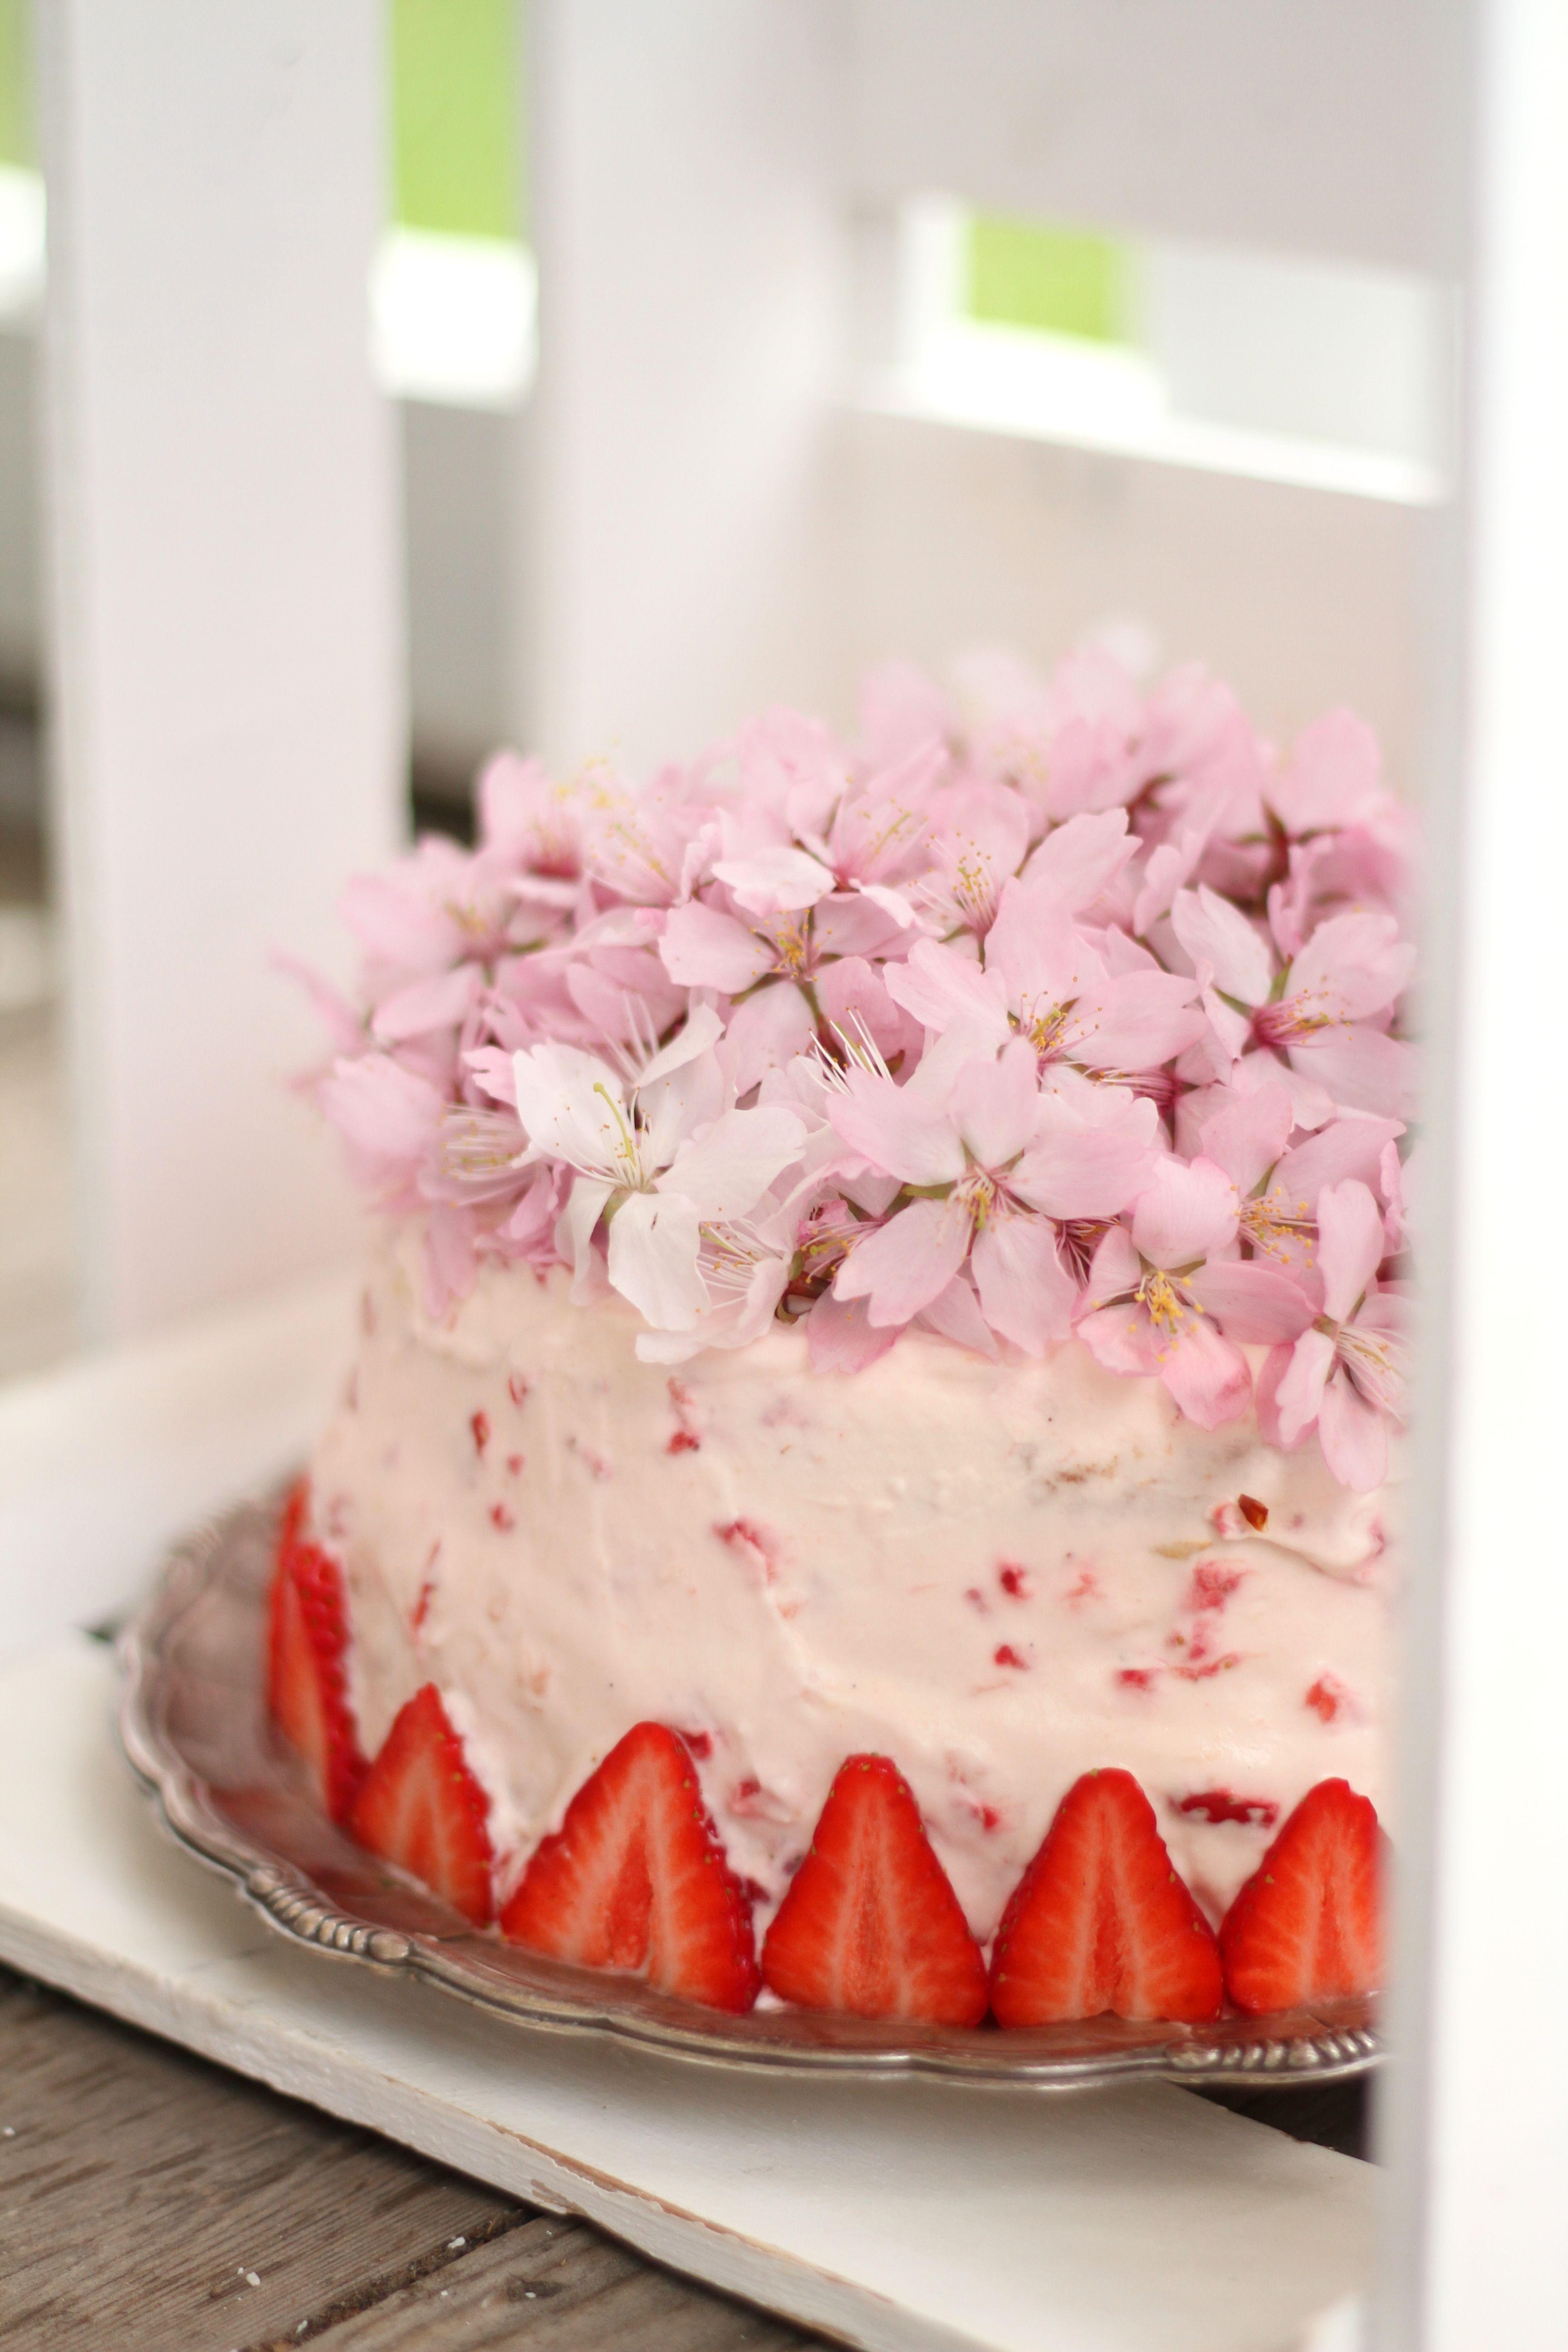 d2fcf3418481 Himmelsk Jordgubbstårta | Fridas bakblogg | Tårta | Tårta recept ...